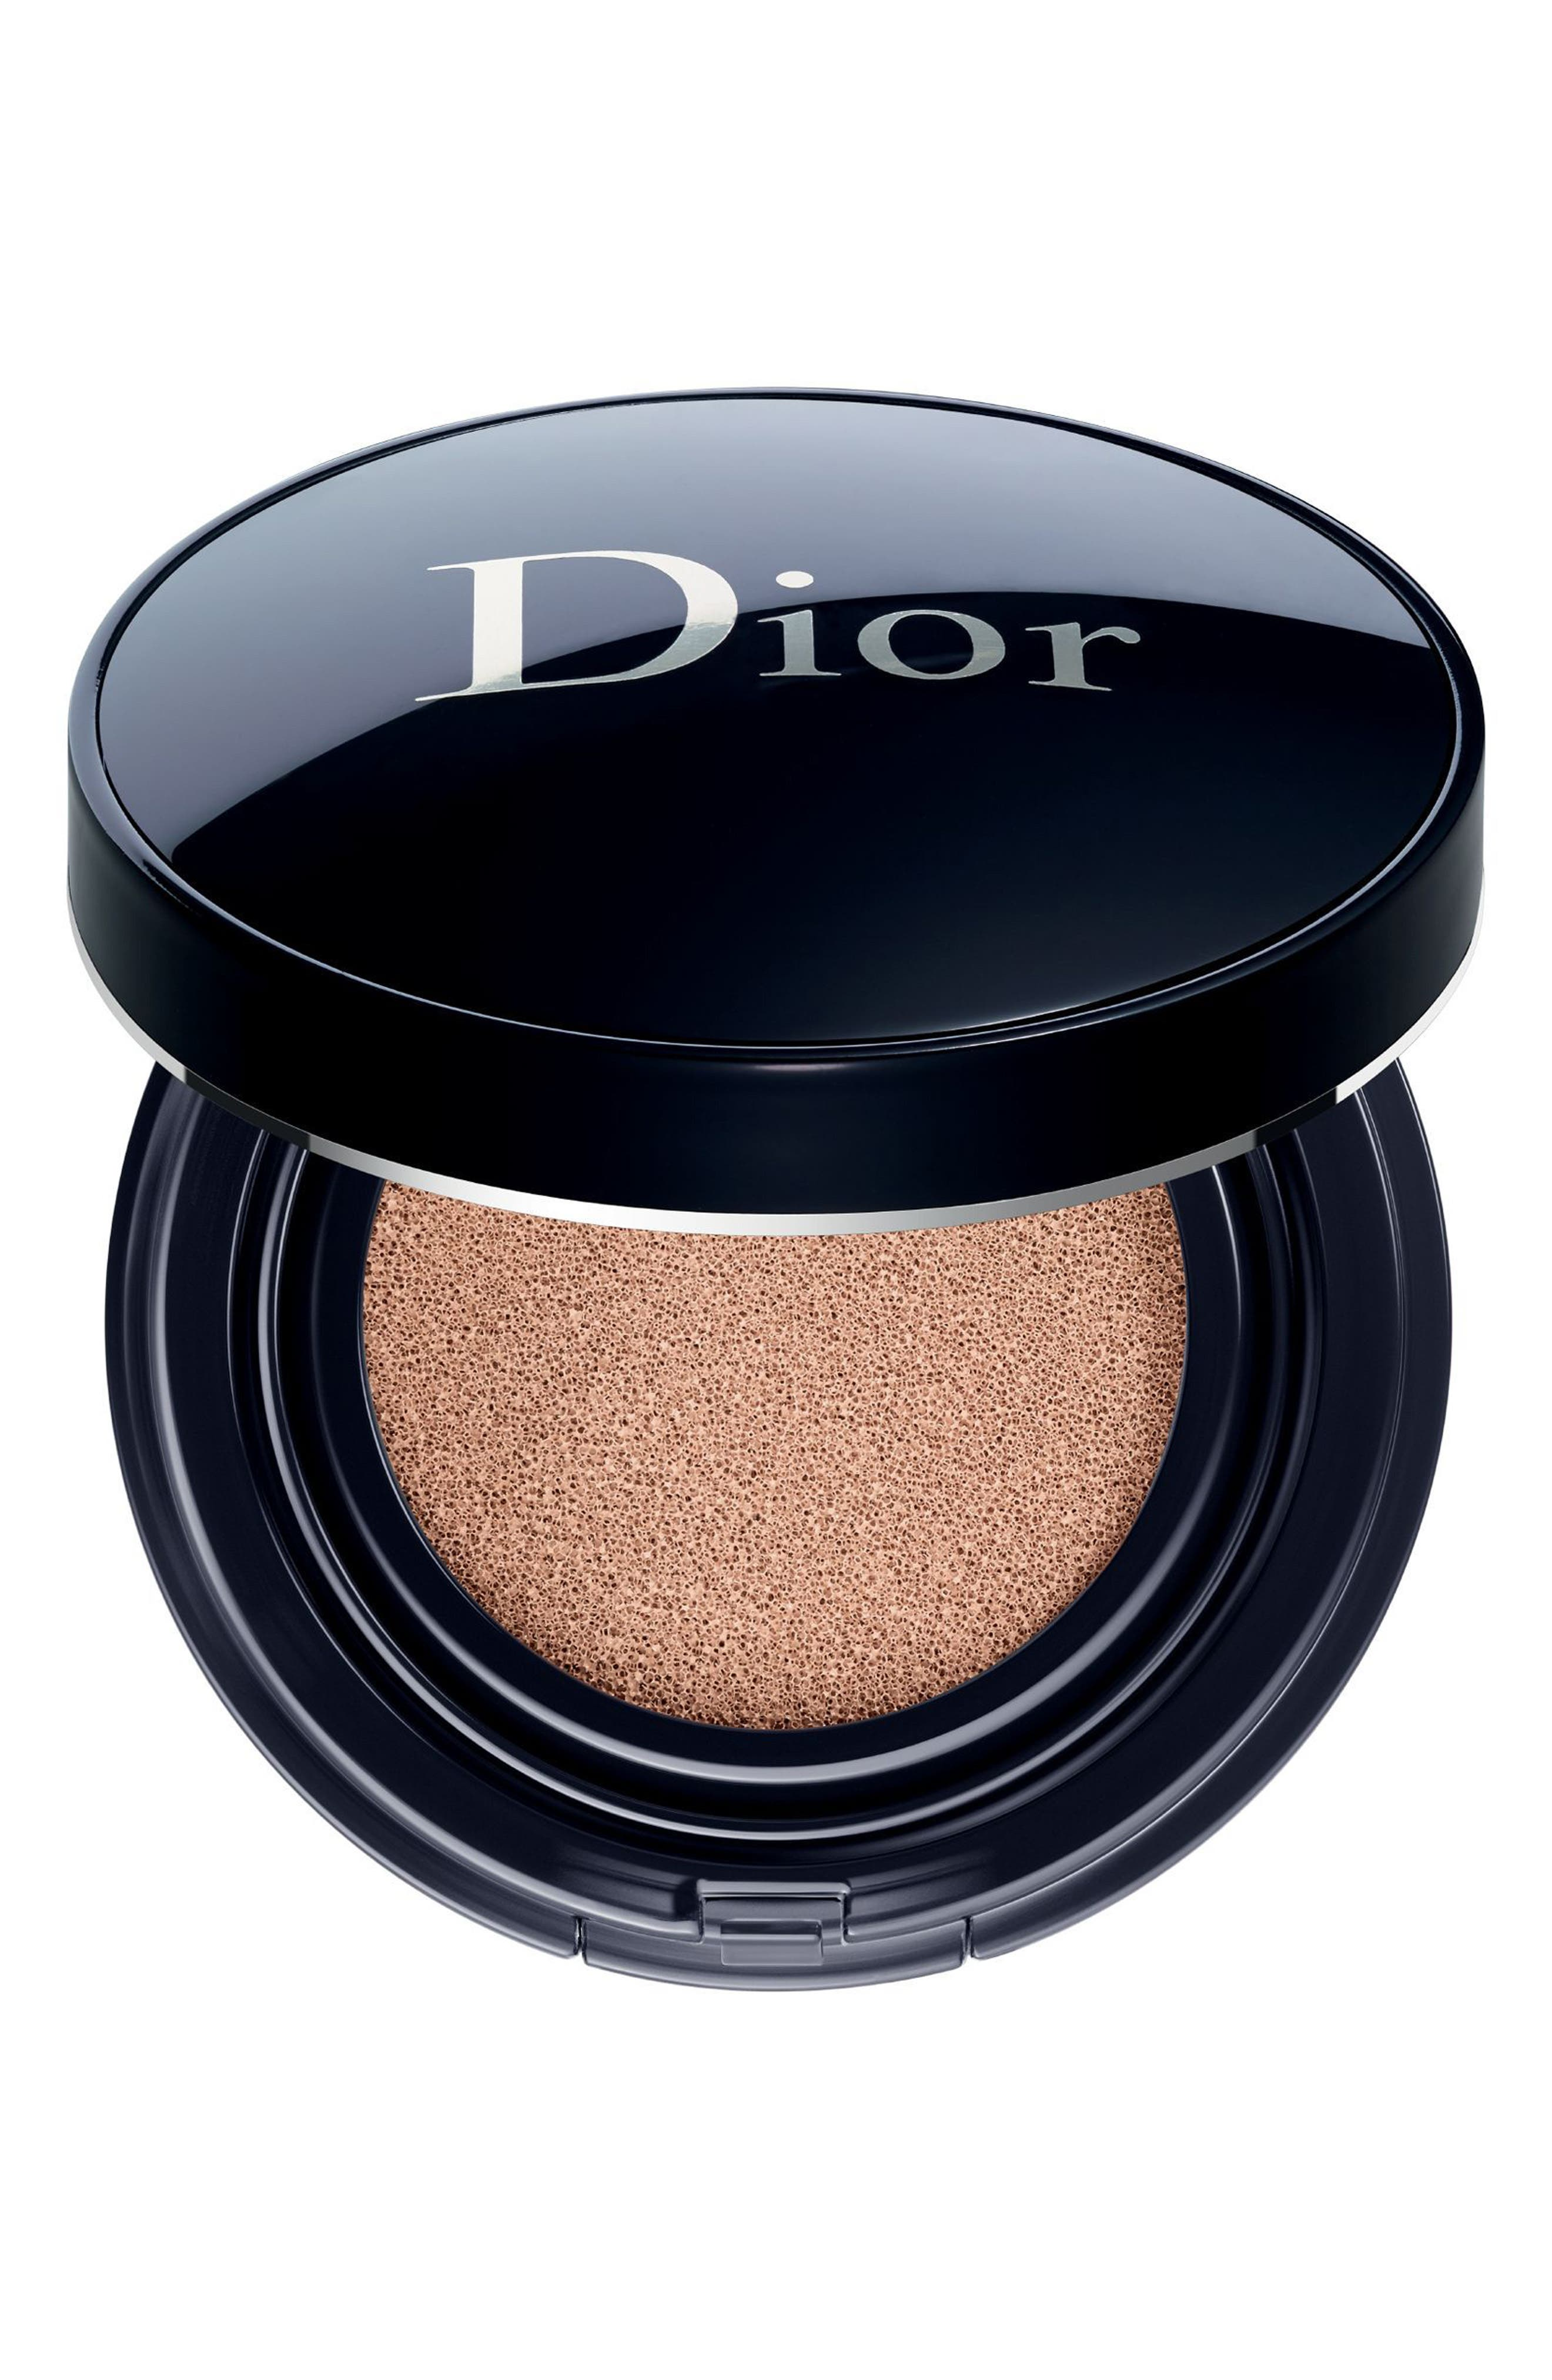 Dior Diorskin Forever Perfect Cushion Foundation Broad Spectrum Spf 35 - 030 Medium Beige